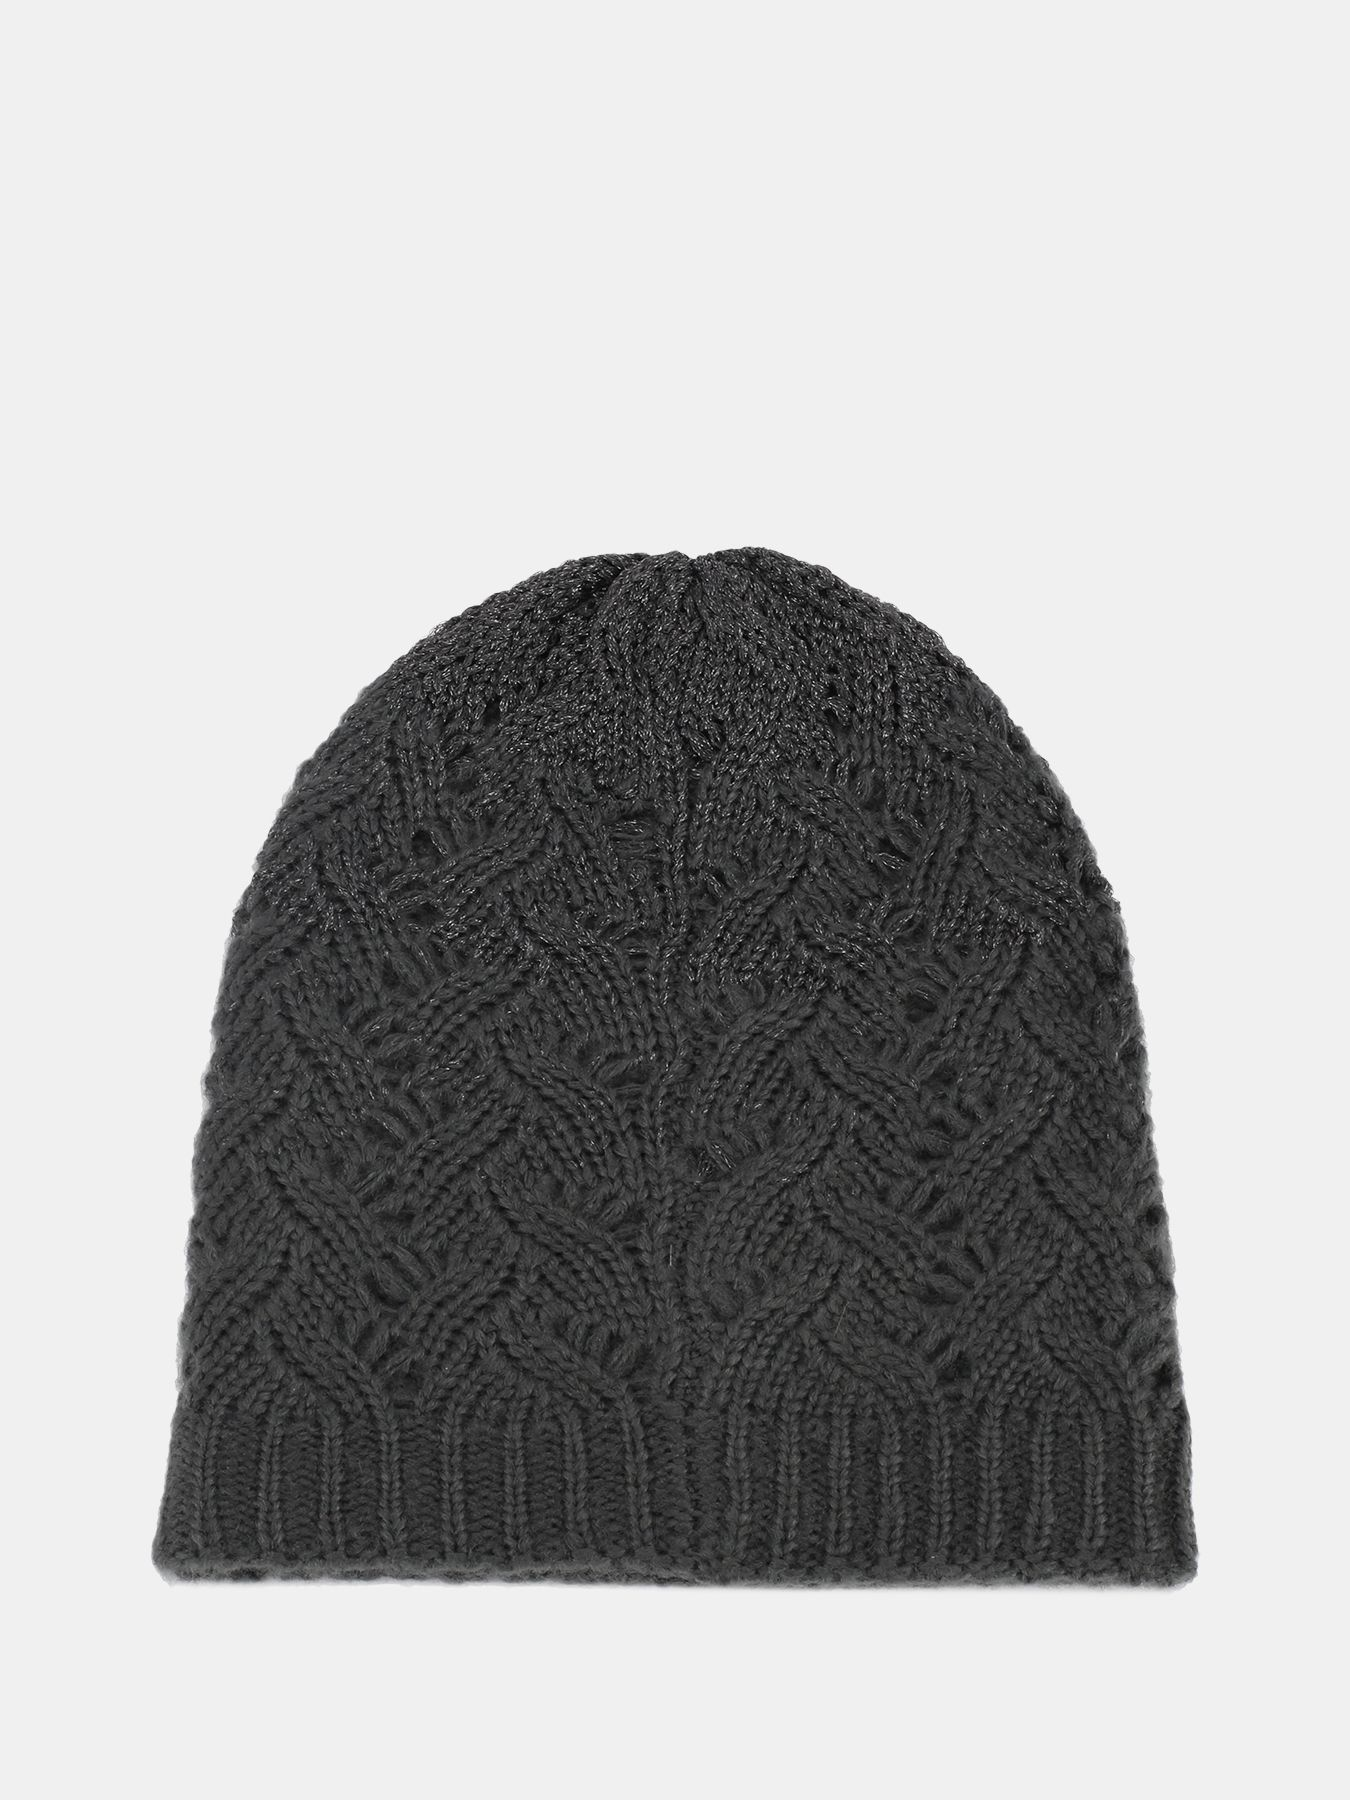 Шапка Alessandro Manzoni Женская шапка шапка freespirit freespirit mp002xw1agwb